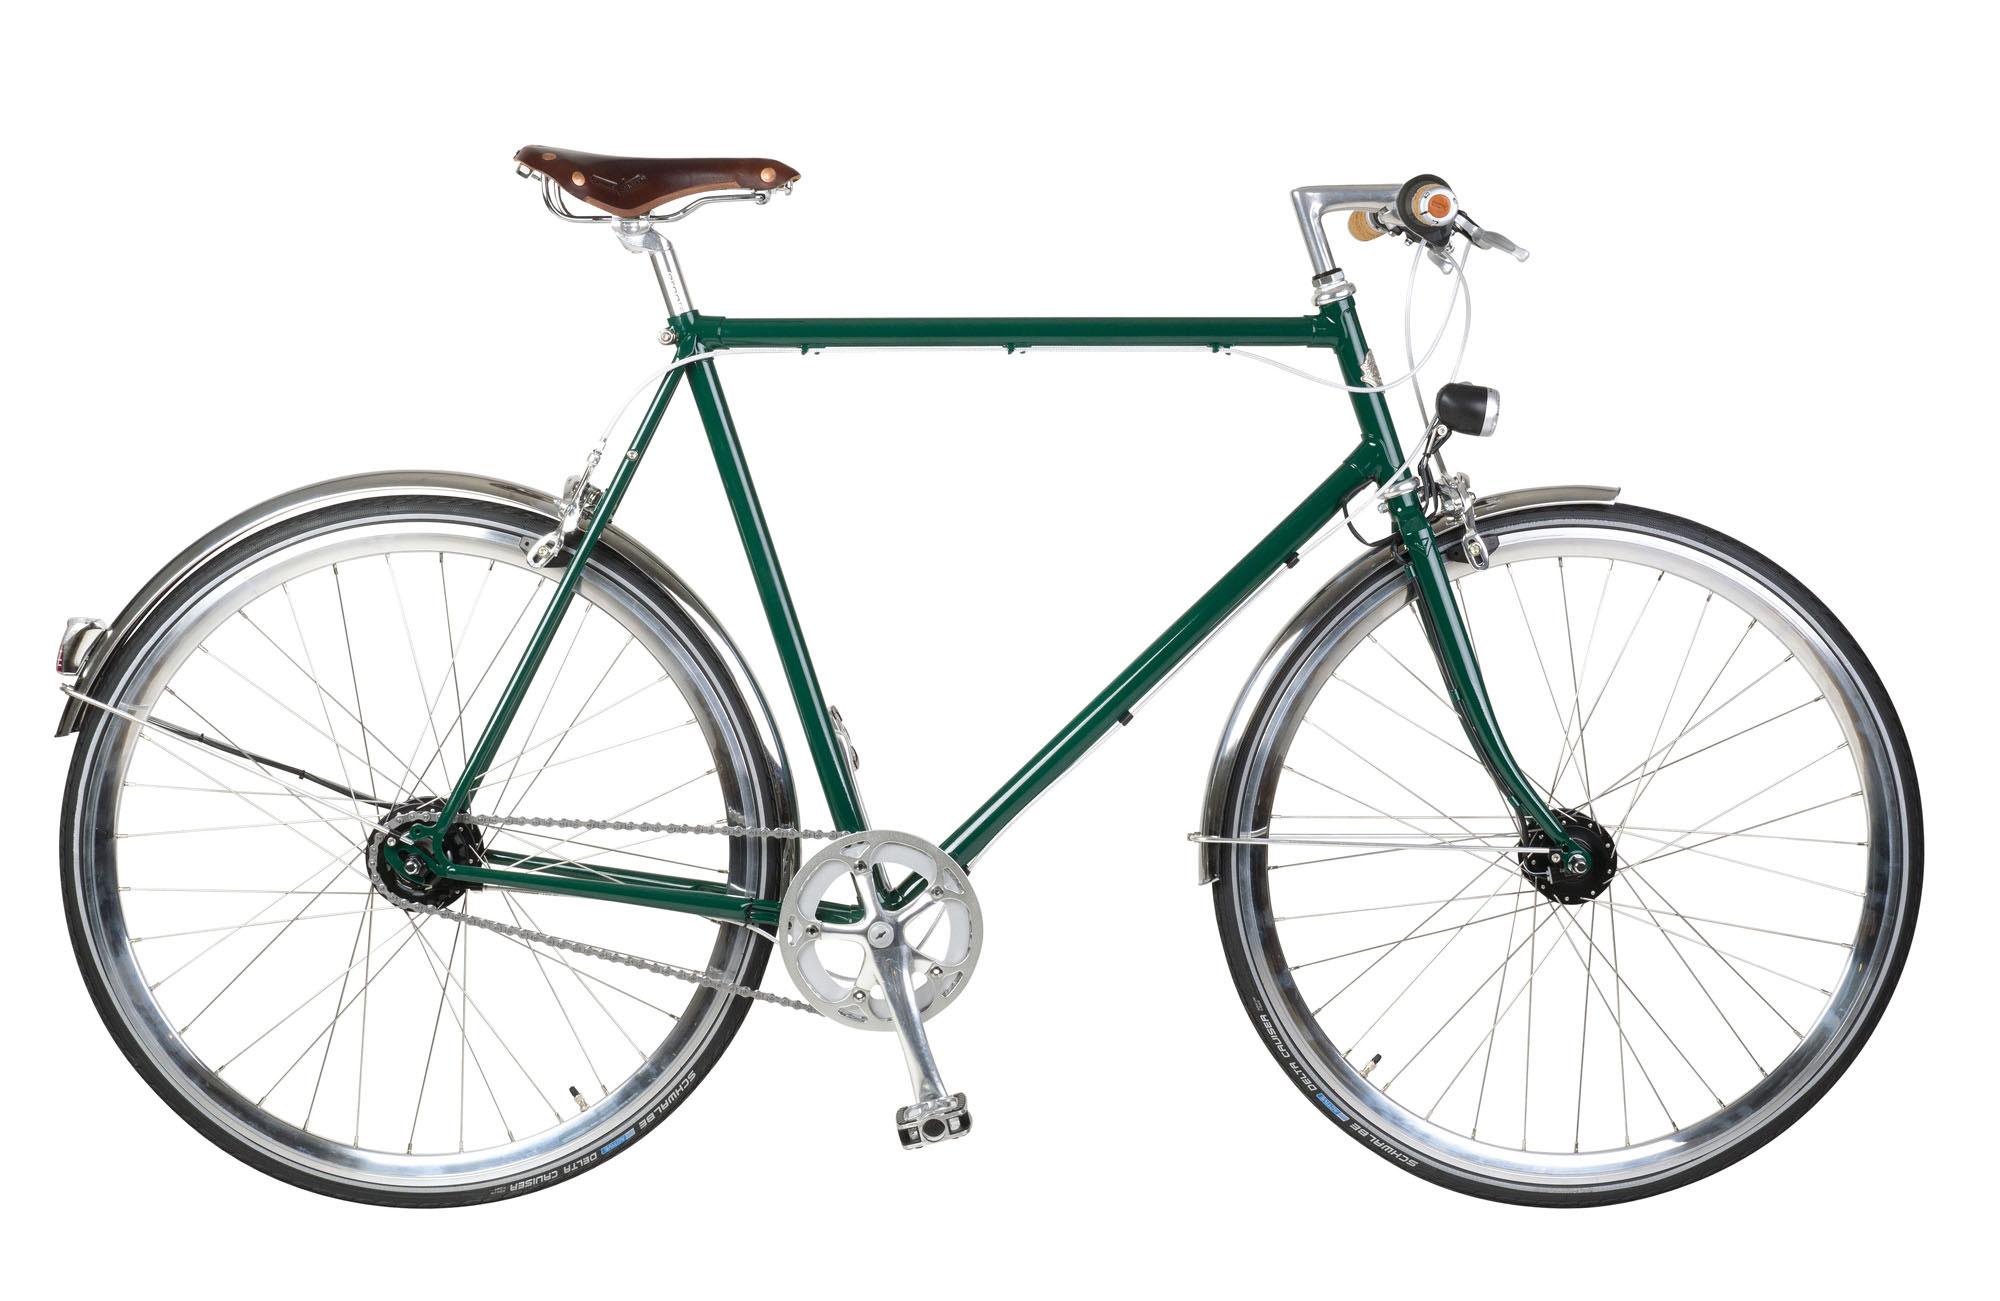 Herrenrad Sport - Klassisches Stahlrahmen Fahrrad handmade in Germany